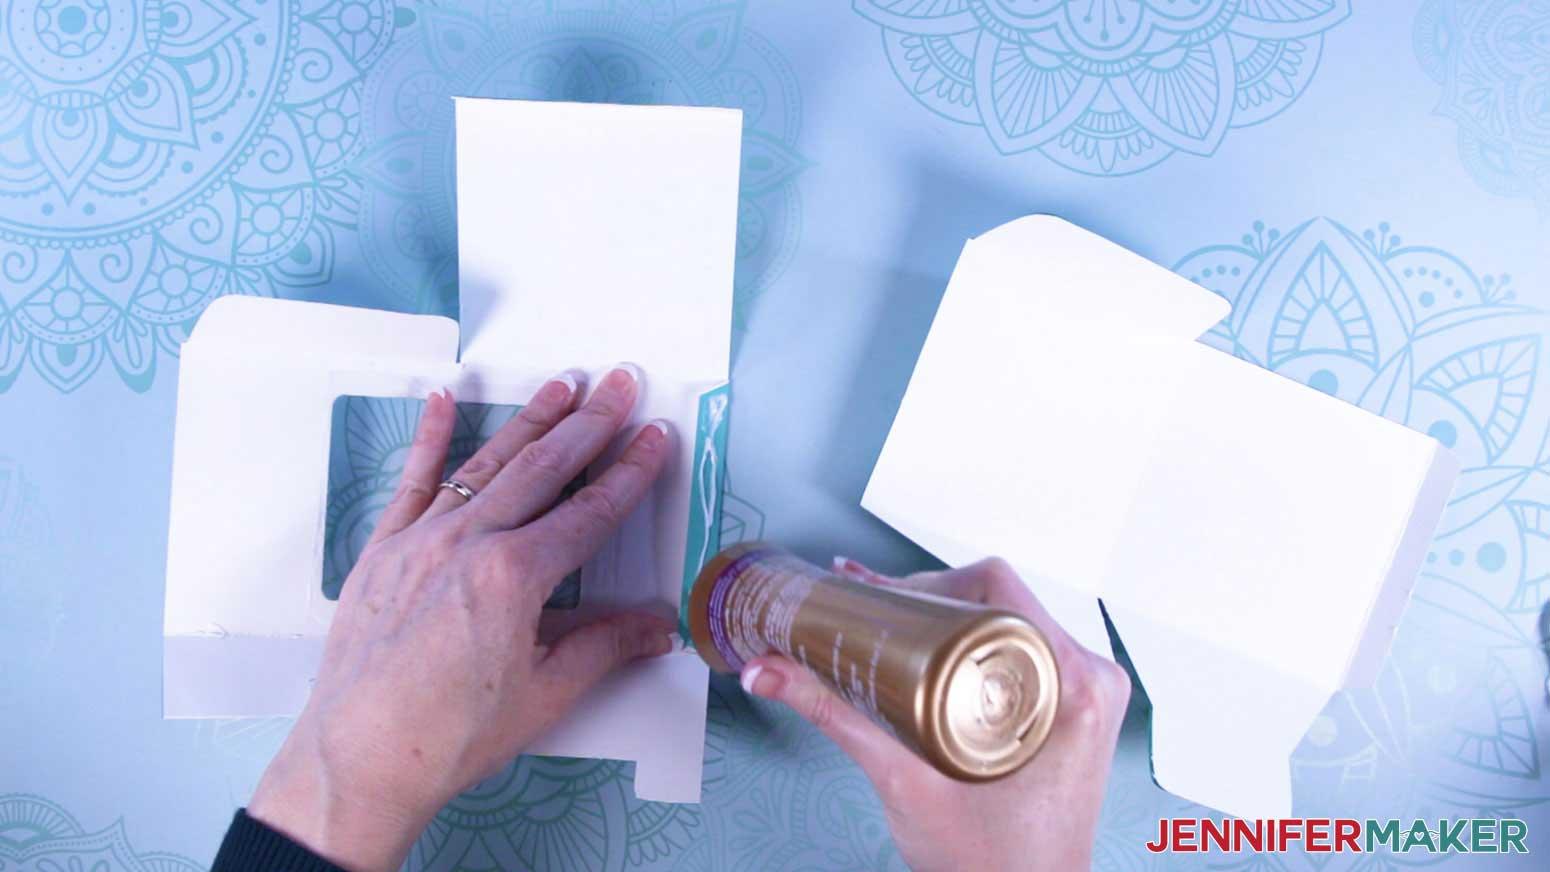 Apply glue to tab of mug gift box with a window